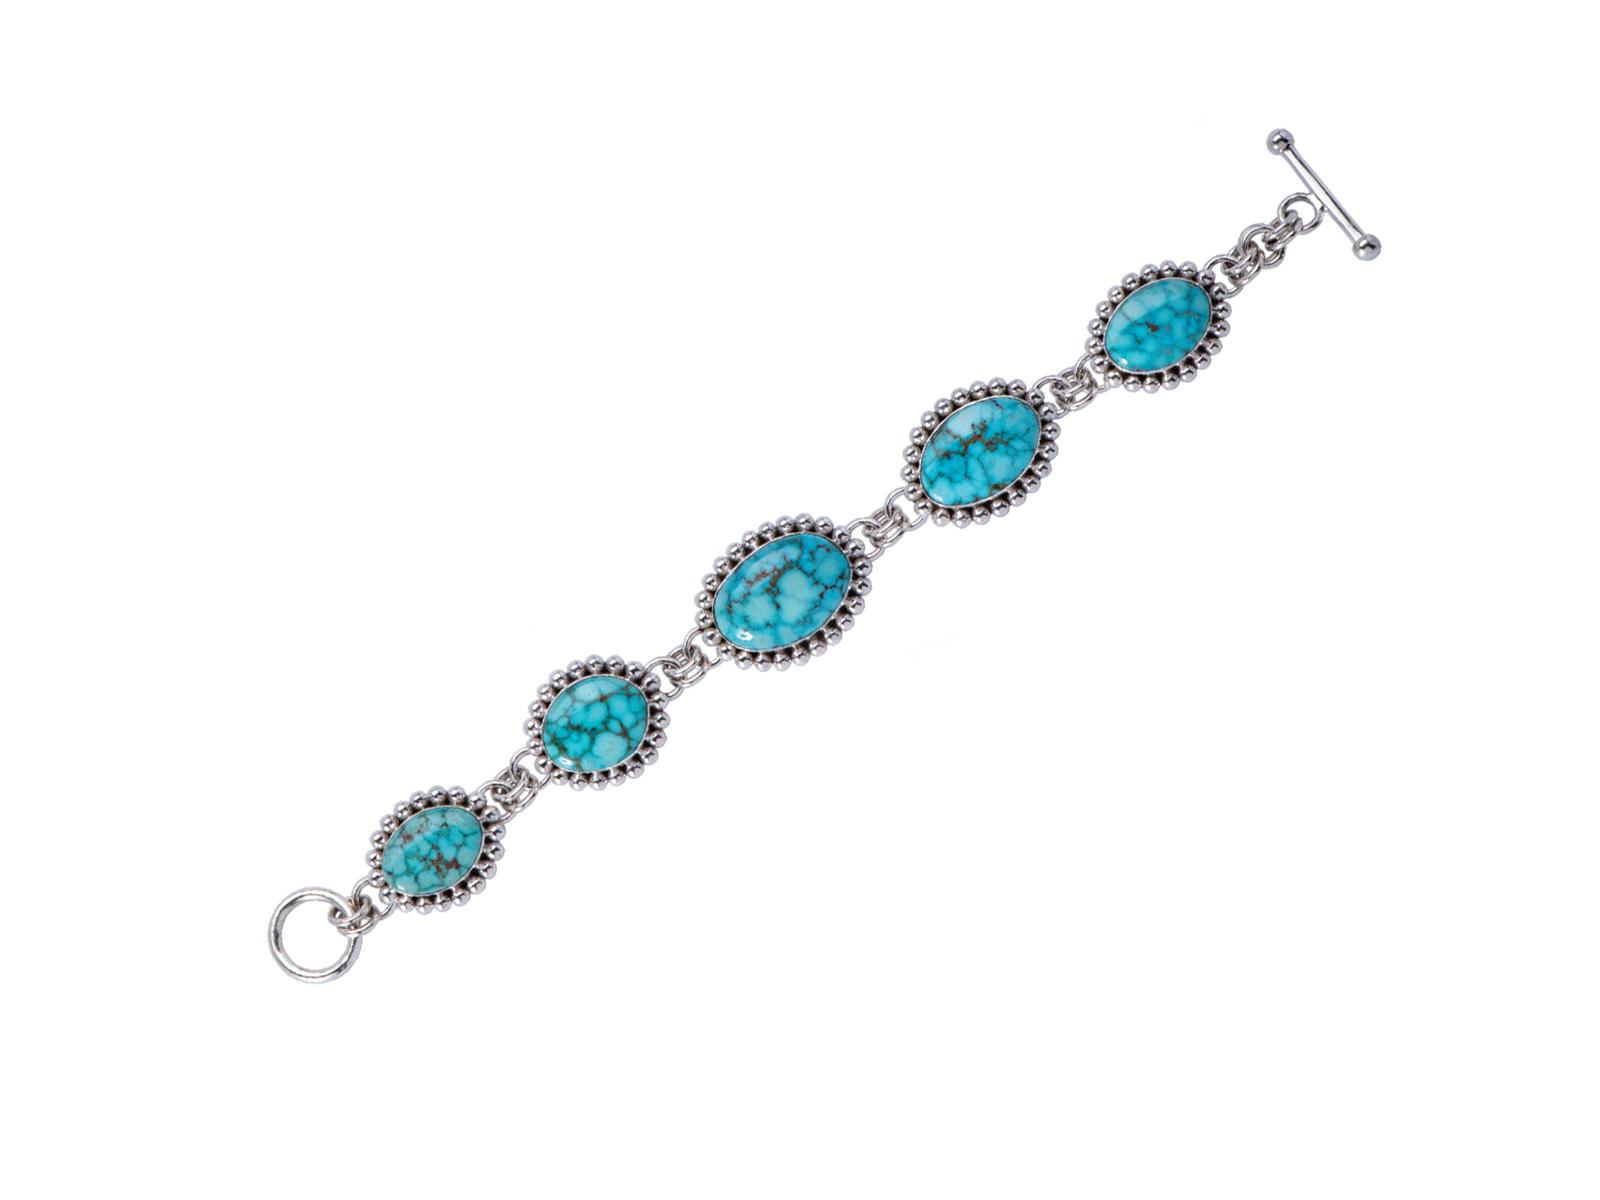 Kingman Turquoise Silver Link Bracelet